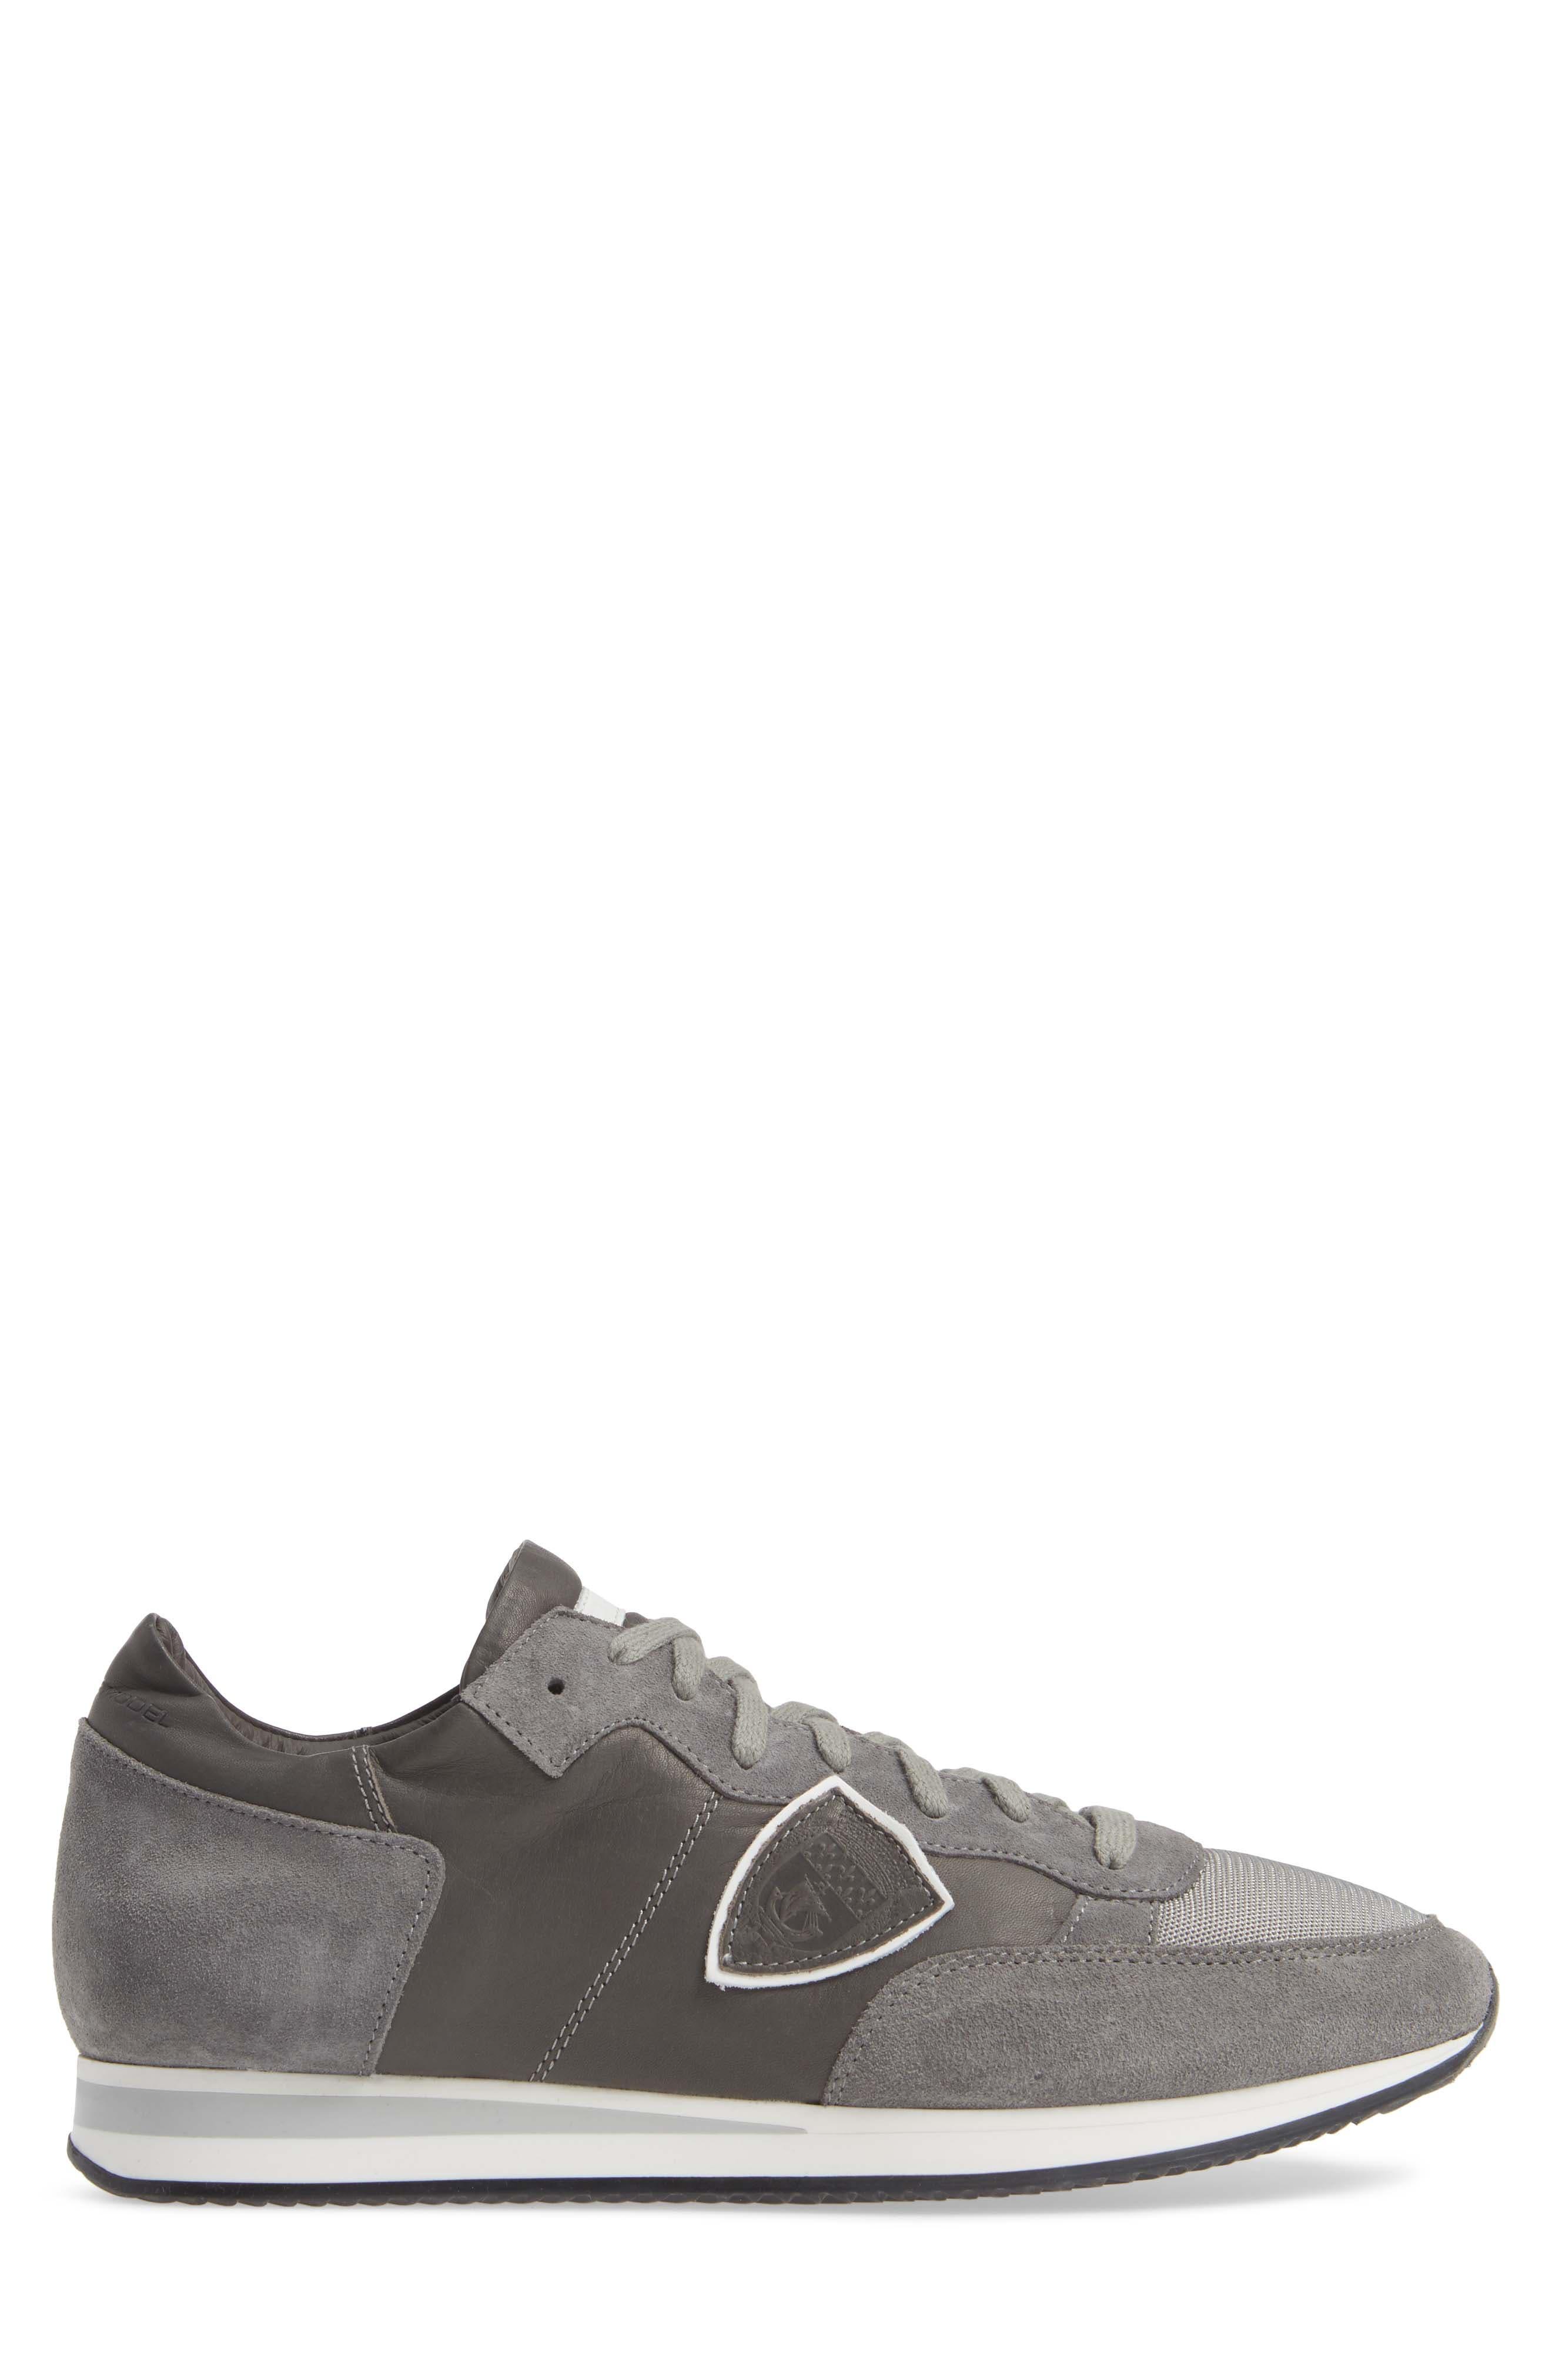 Tropez Sneaker,                             Alternate thumbnail 3, color,                             020